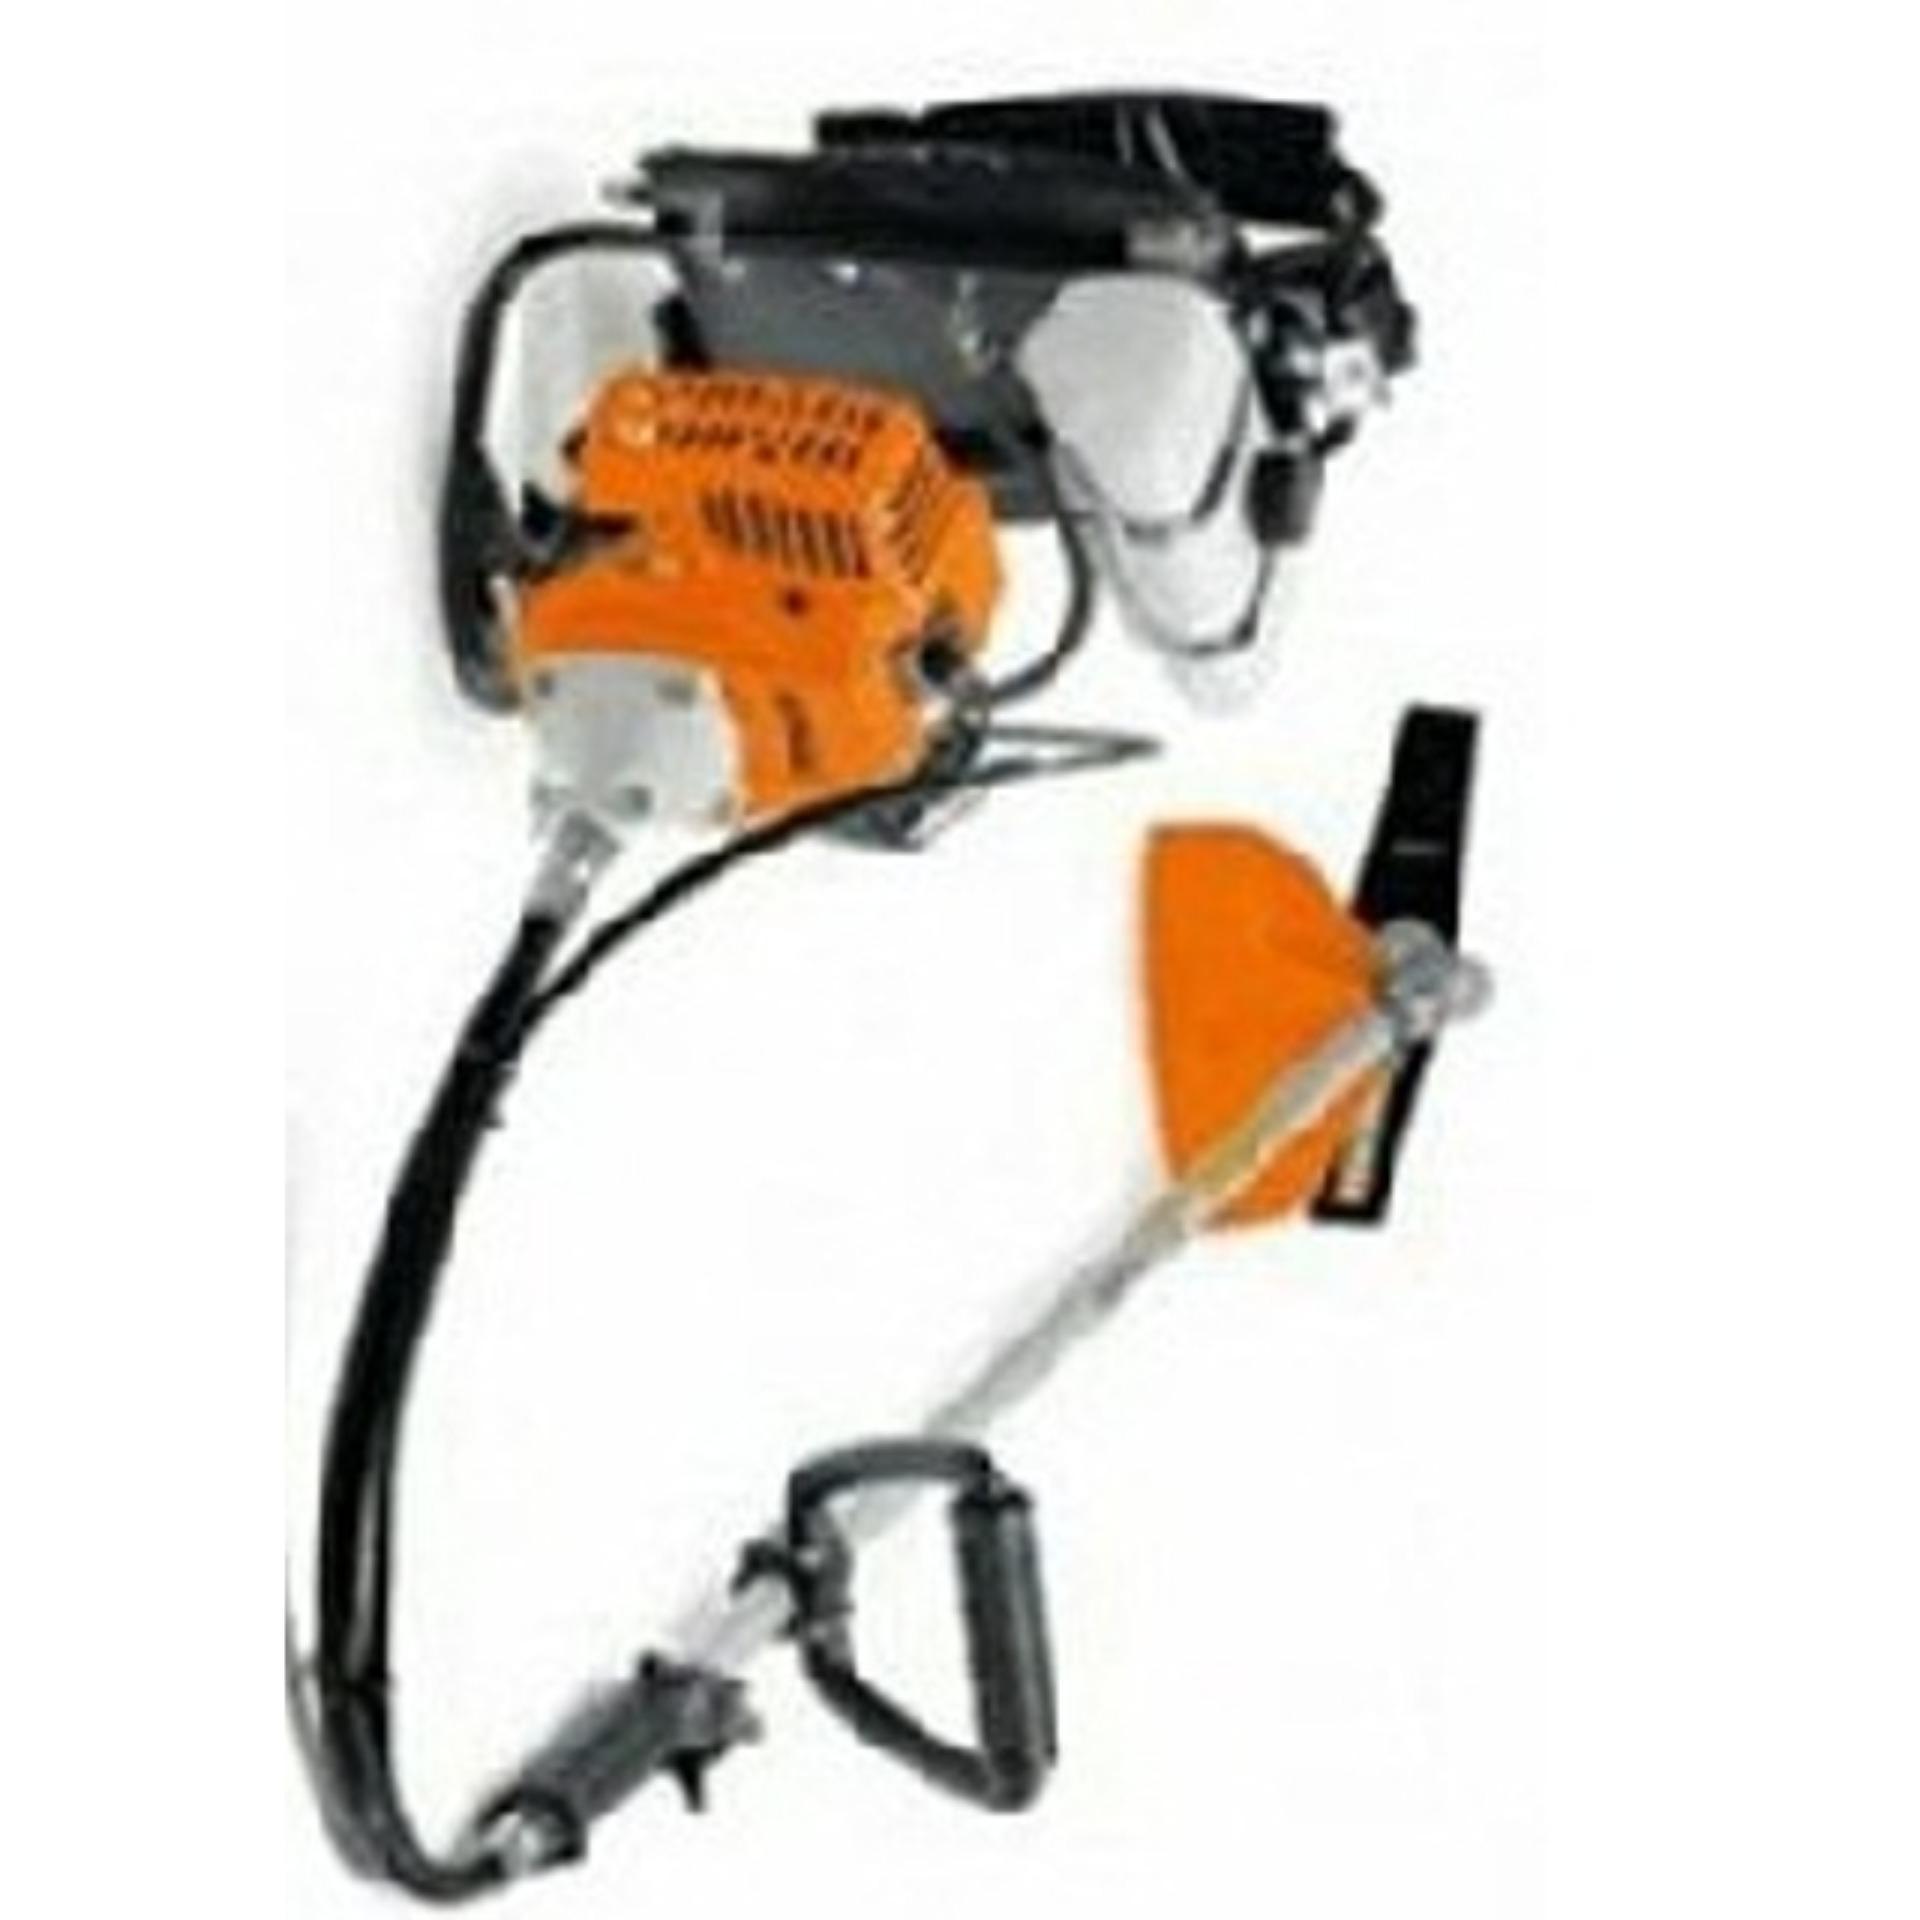 Stihl Mesin Potong Rumput Brush Cutter Fr 3001 Daftar Harga Backpack Krisbow 125kw Kw2001355 Fr30001